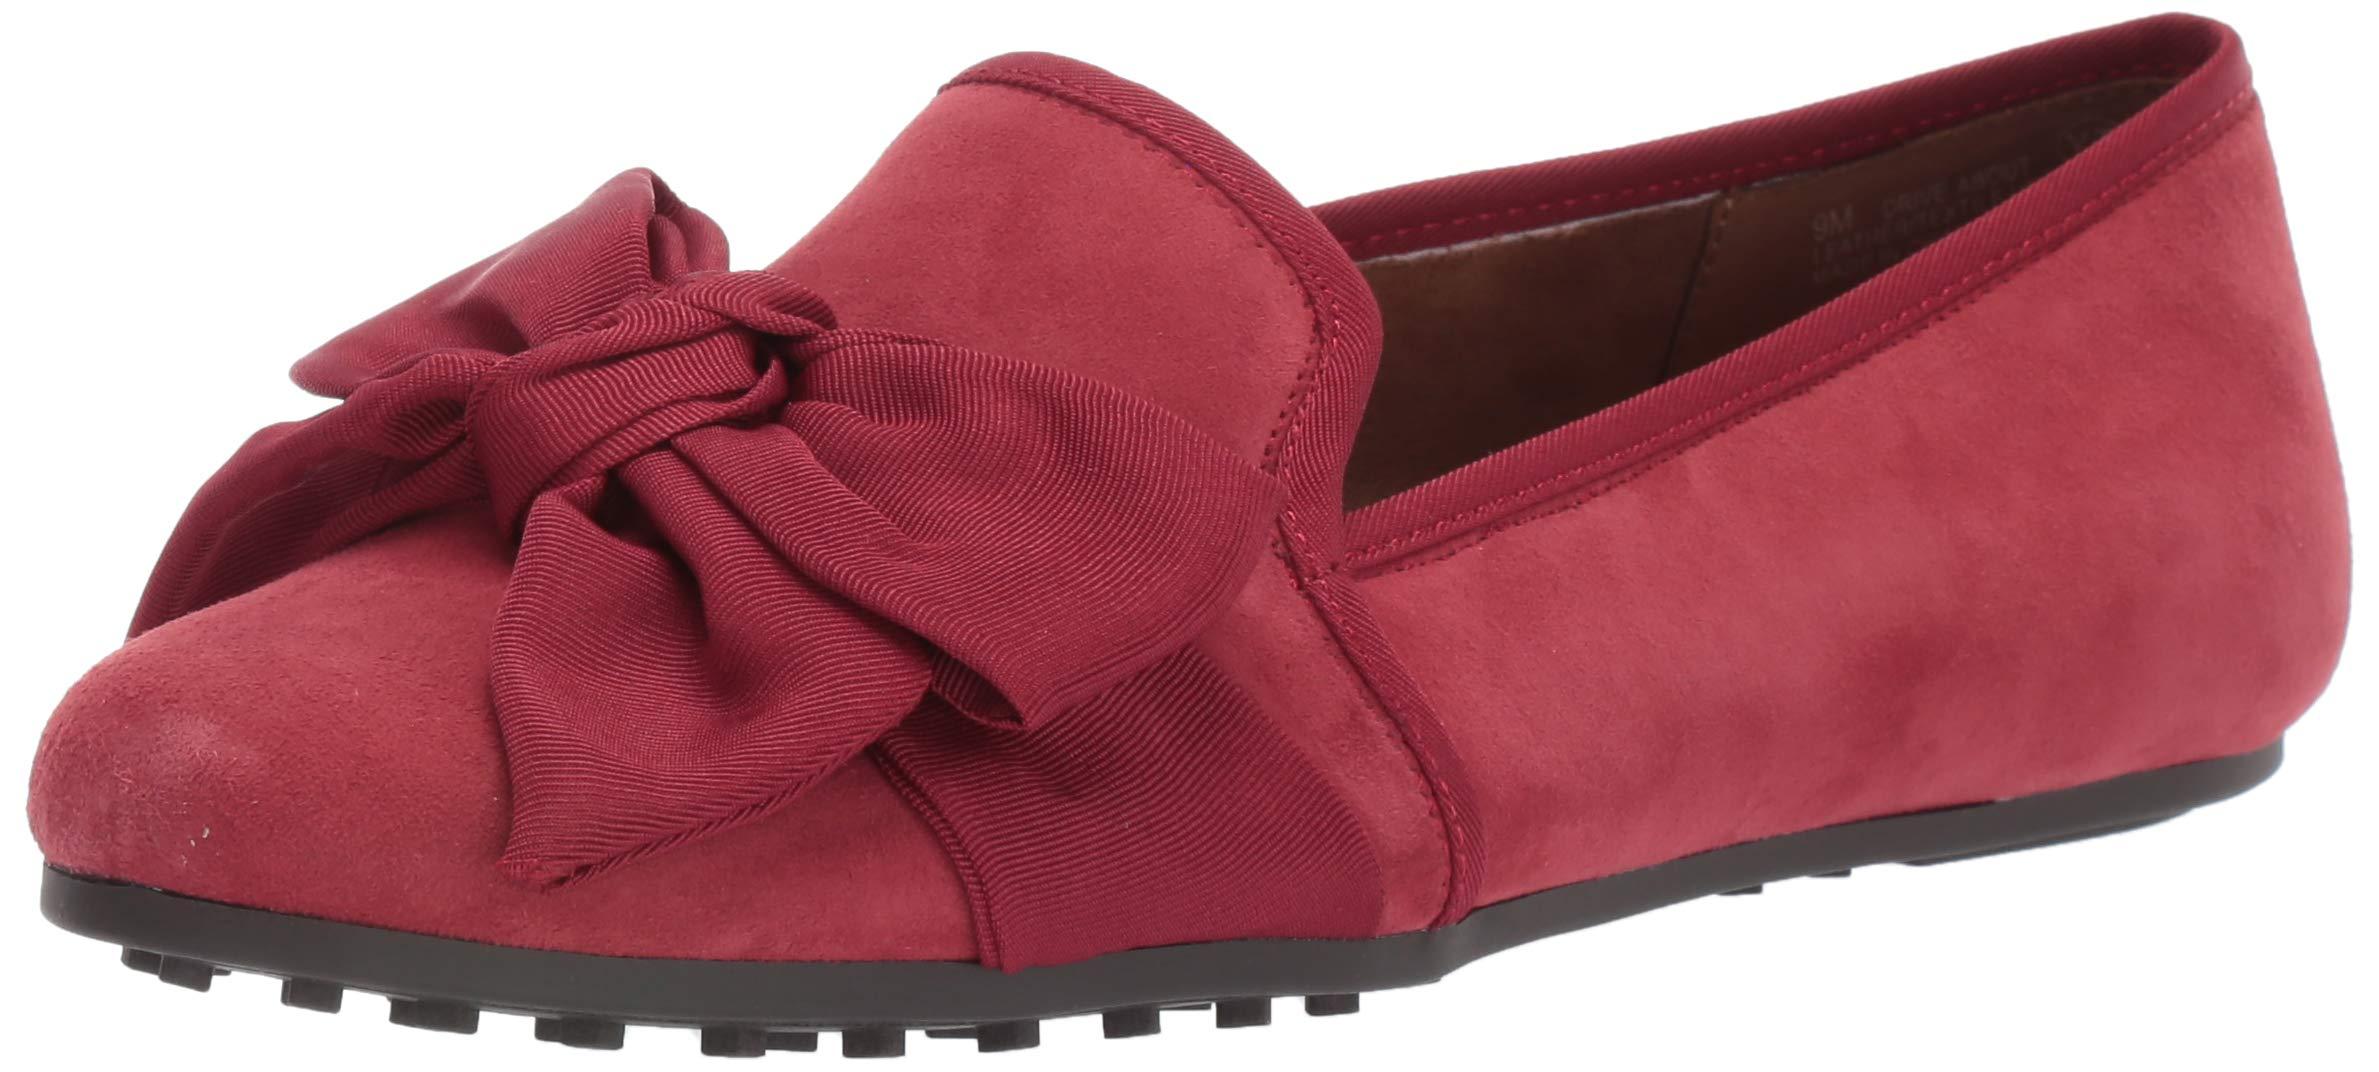 Aerosoles Women's Driving Style Loafer, Dark Red Suede, 11 M US by Aerosoles